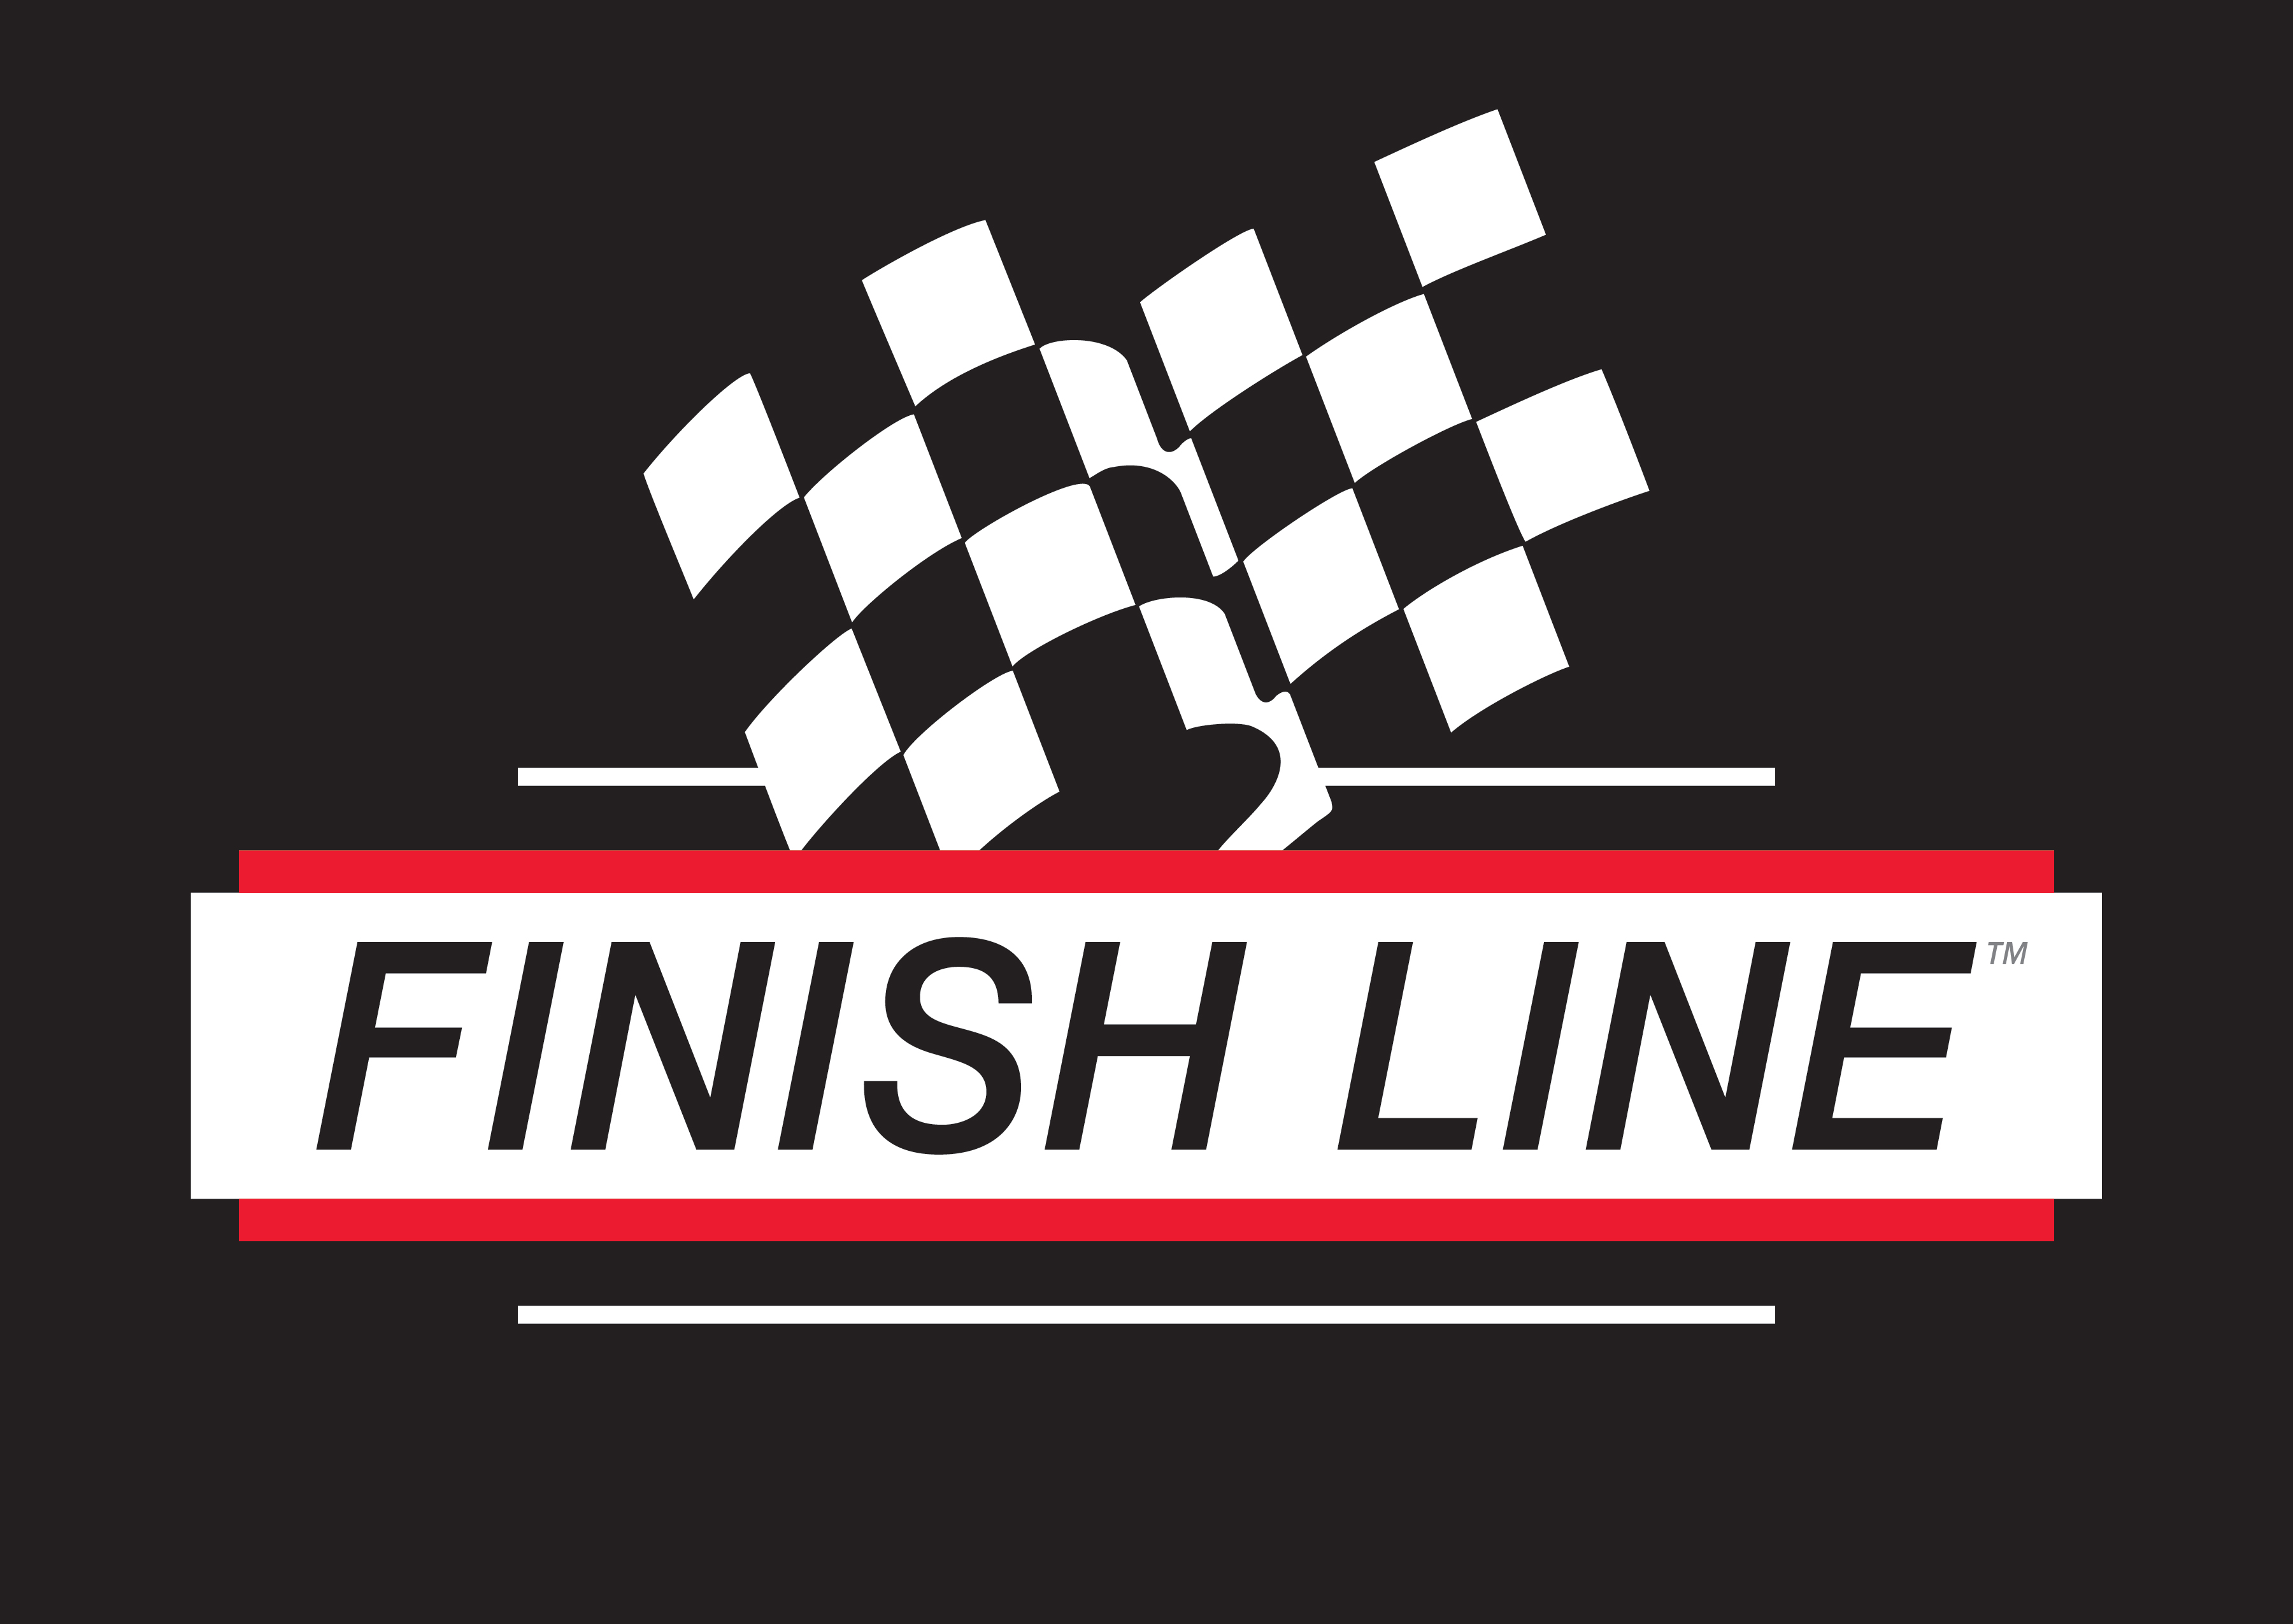 Finish line Logos